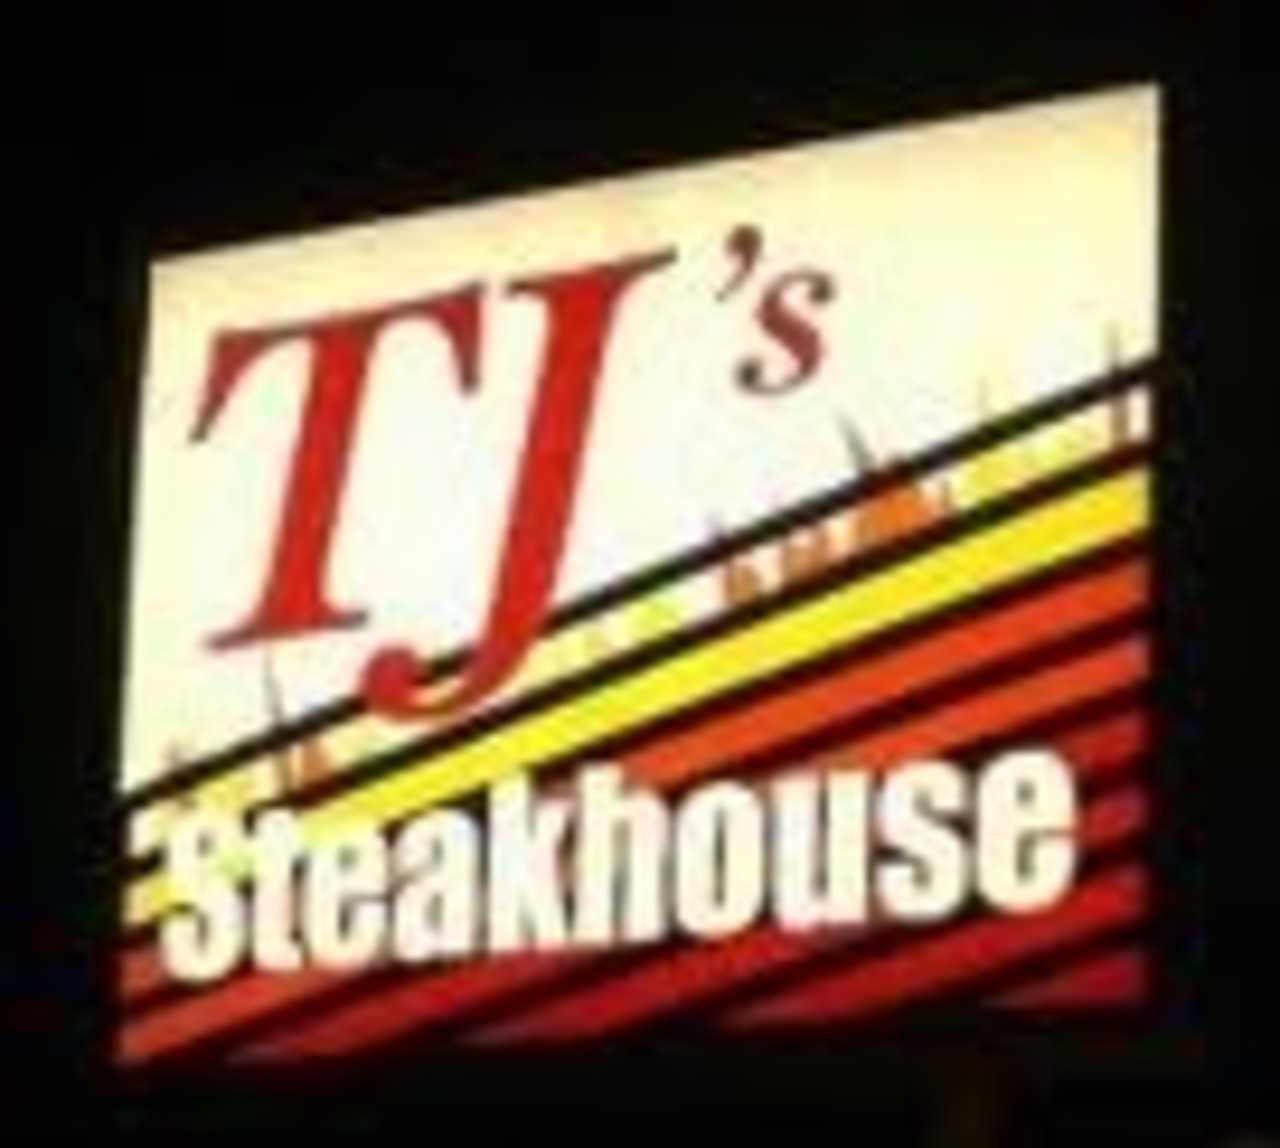 Tj's Steakhouse - Food and Beverage - Restaurants in cedar Rapids IA